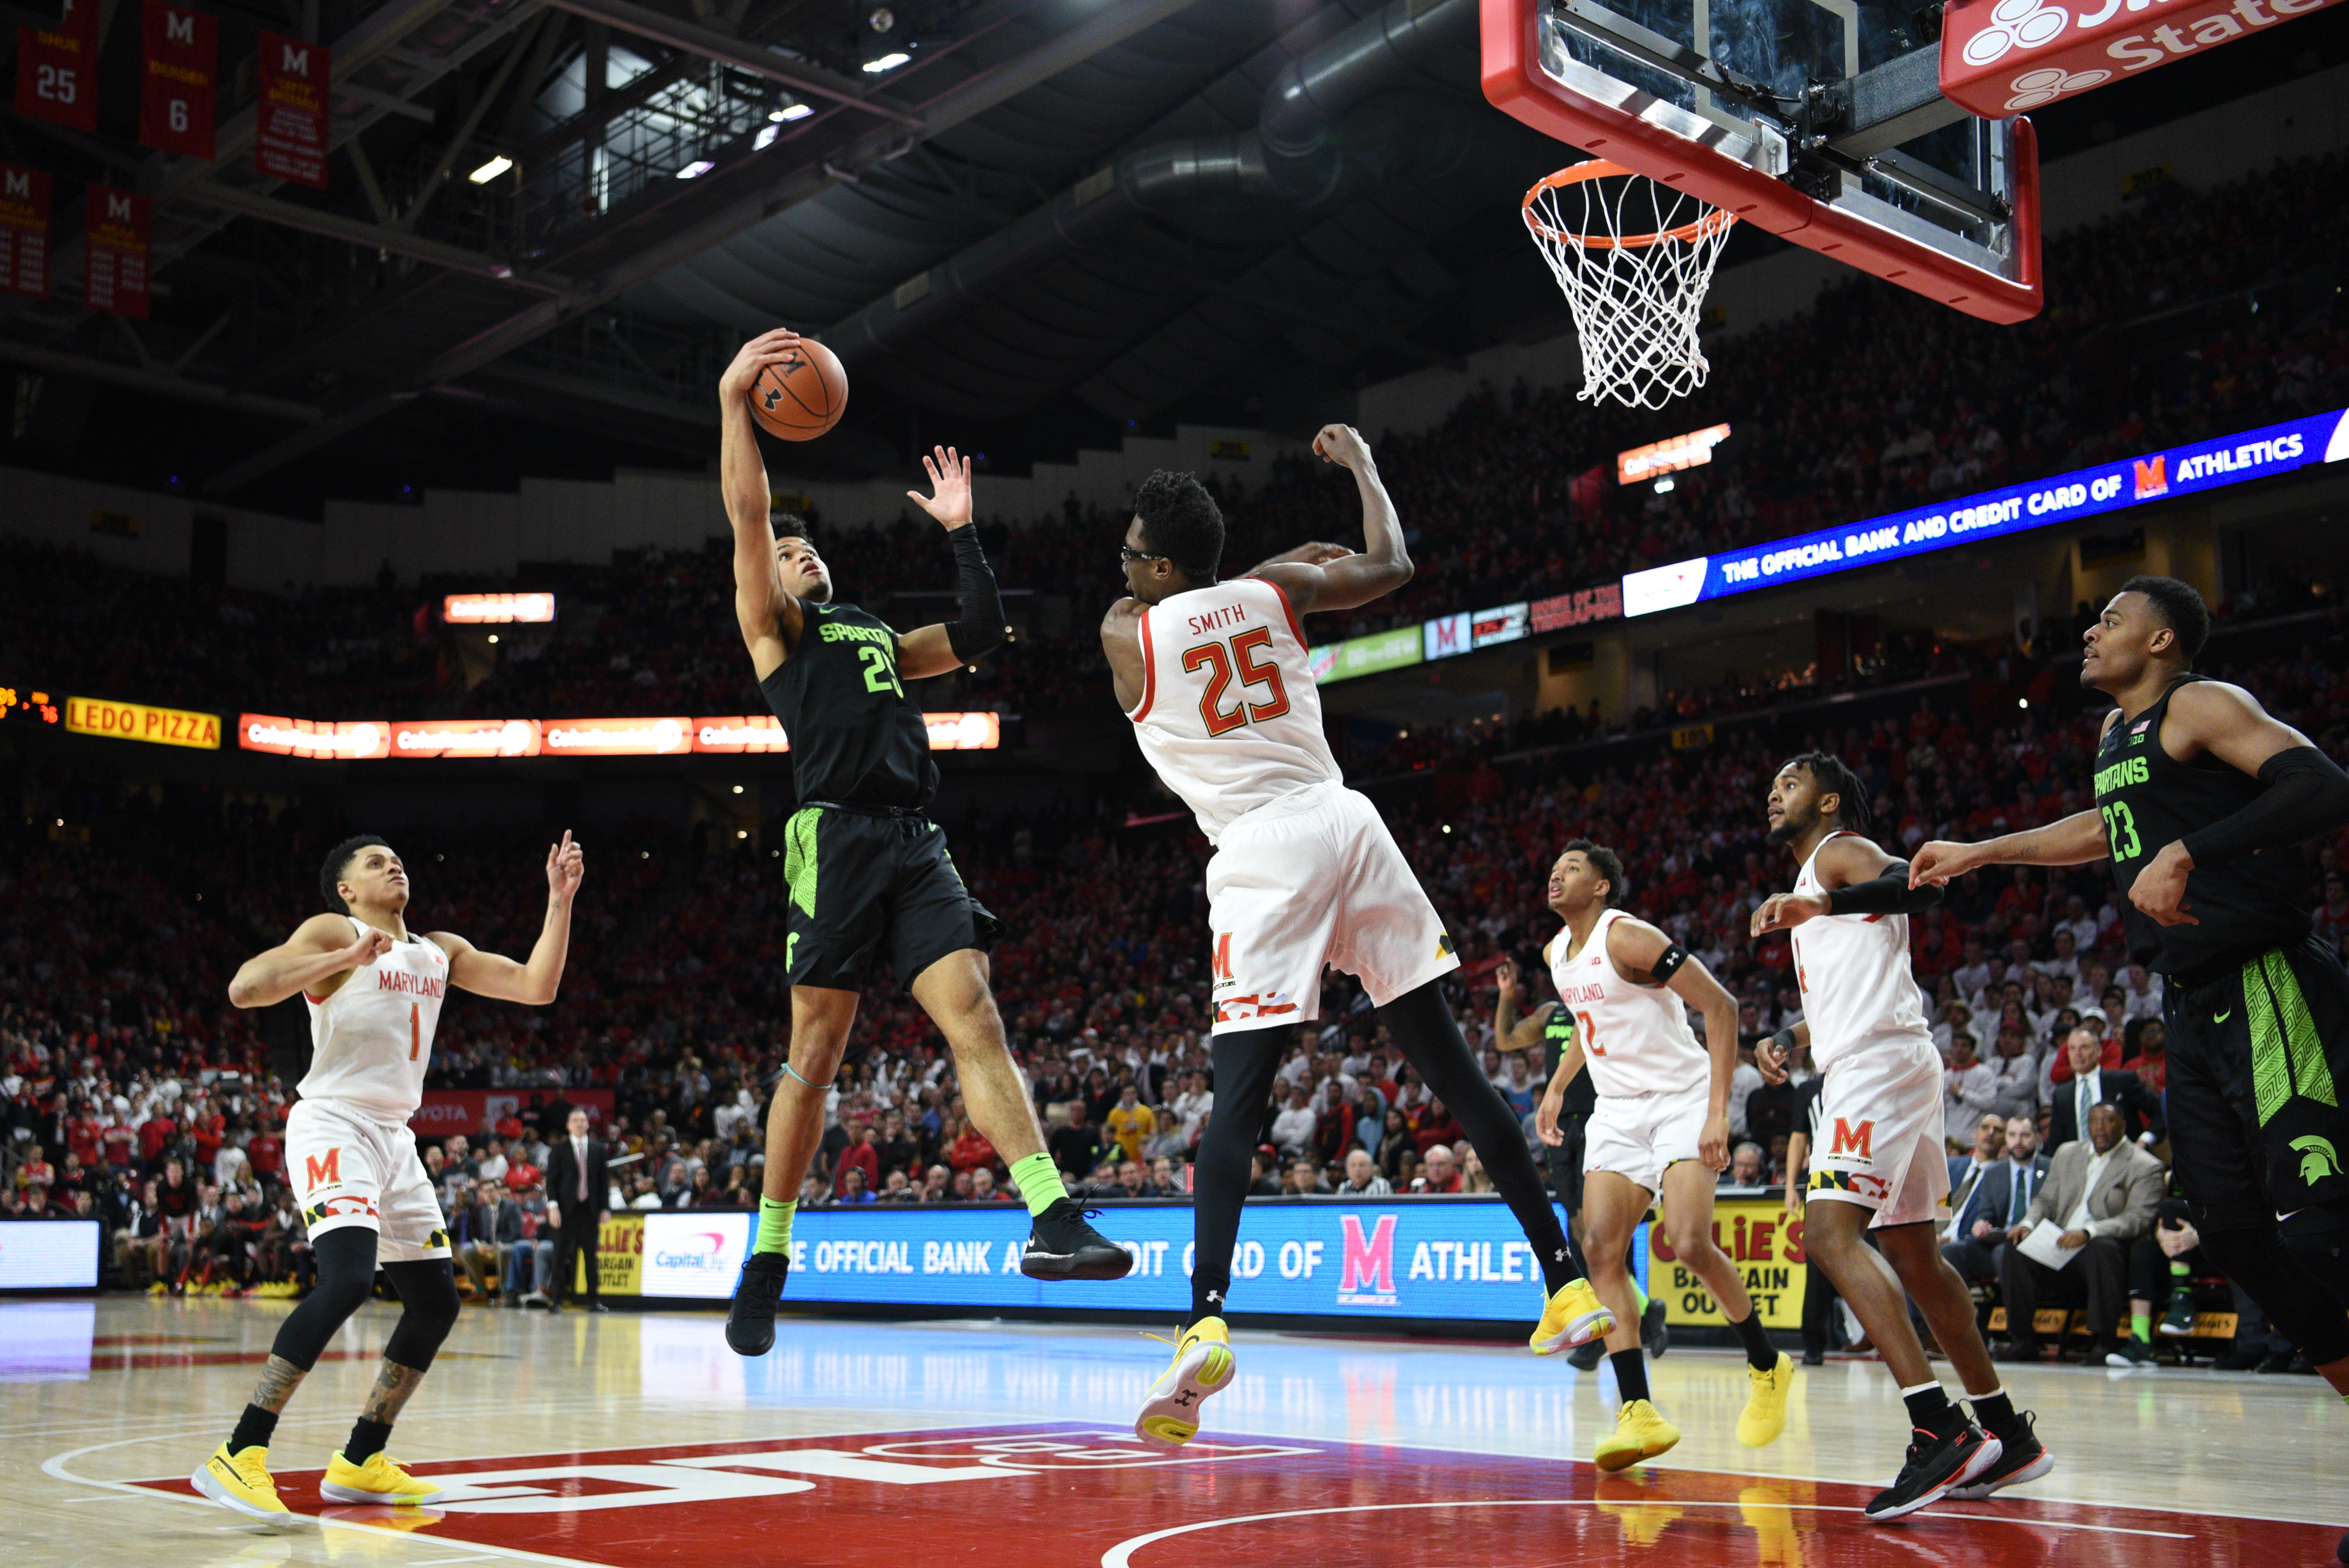 Michigan State offensive rebound vs Maryland, 2020